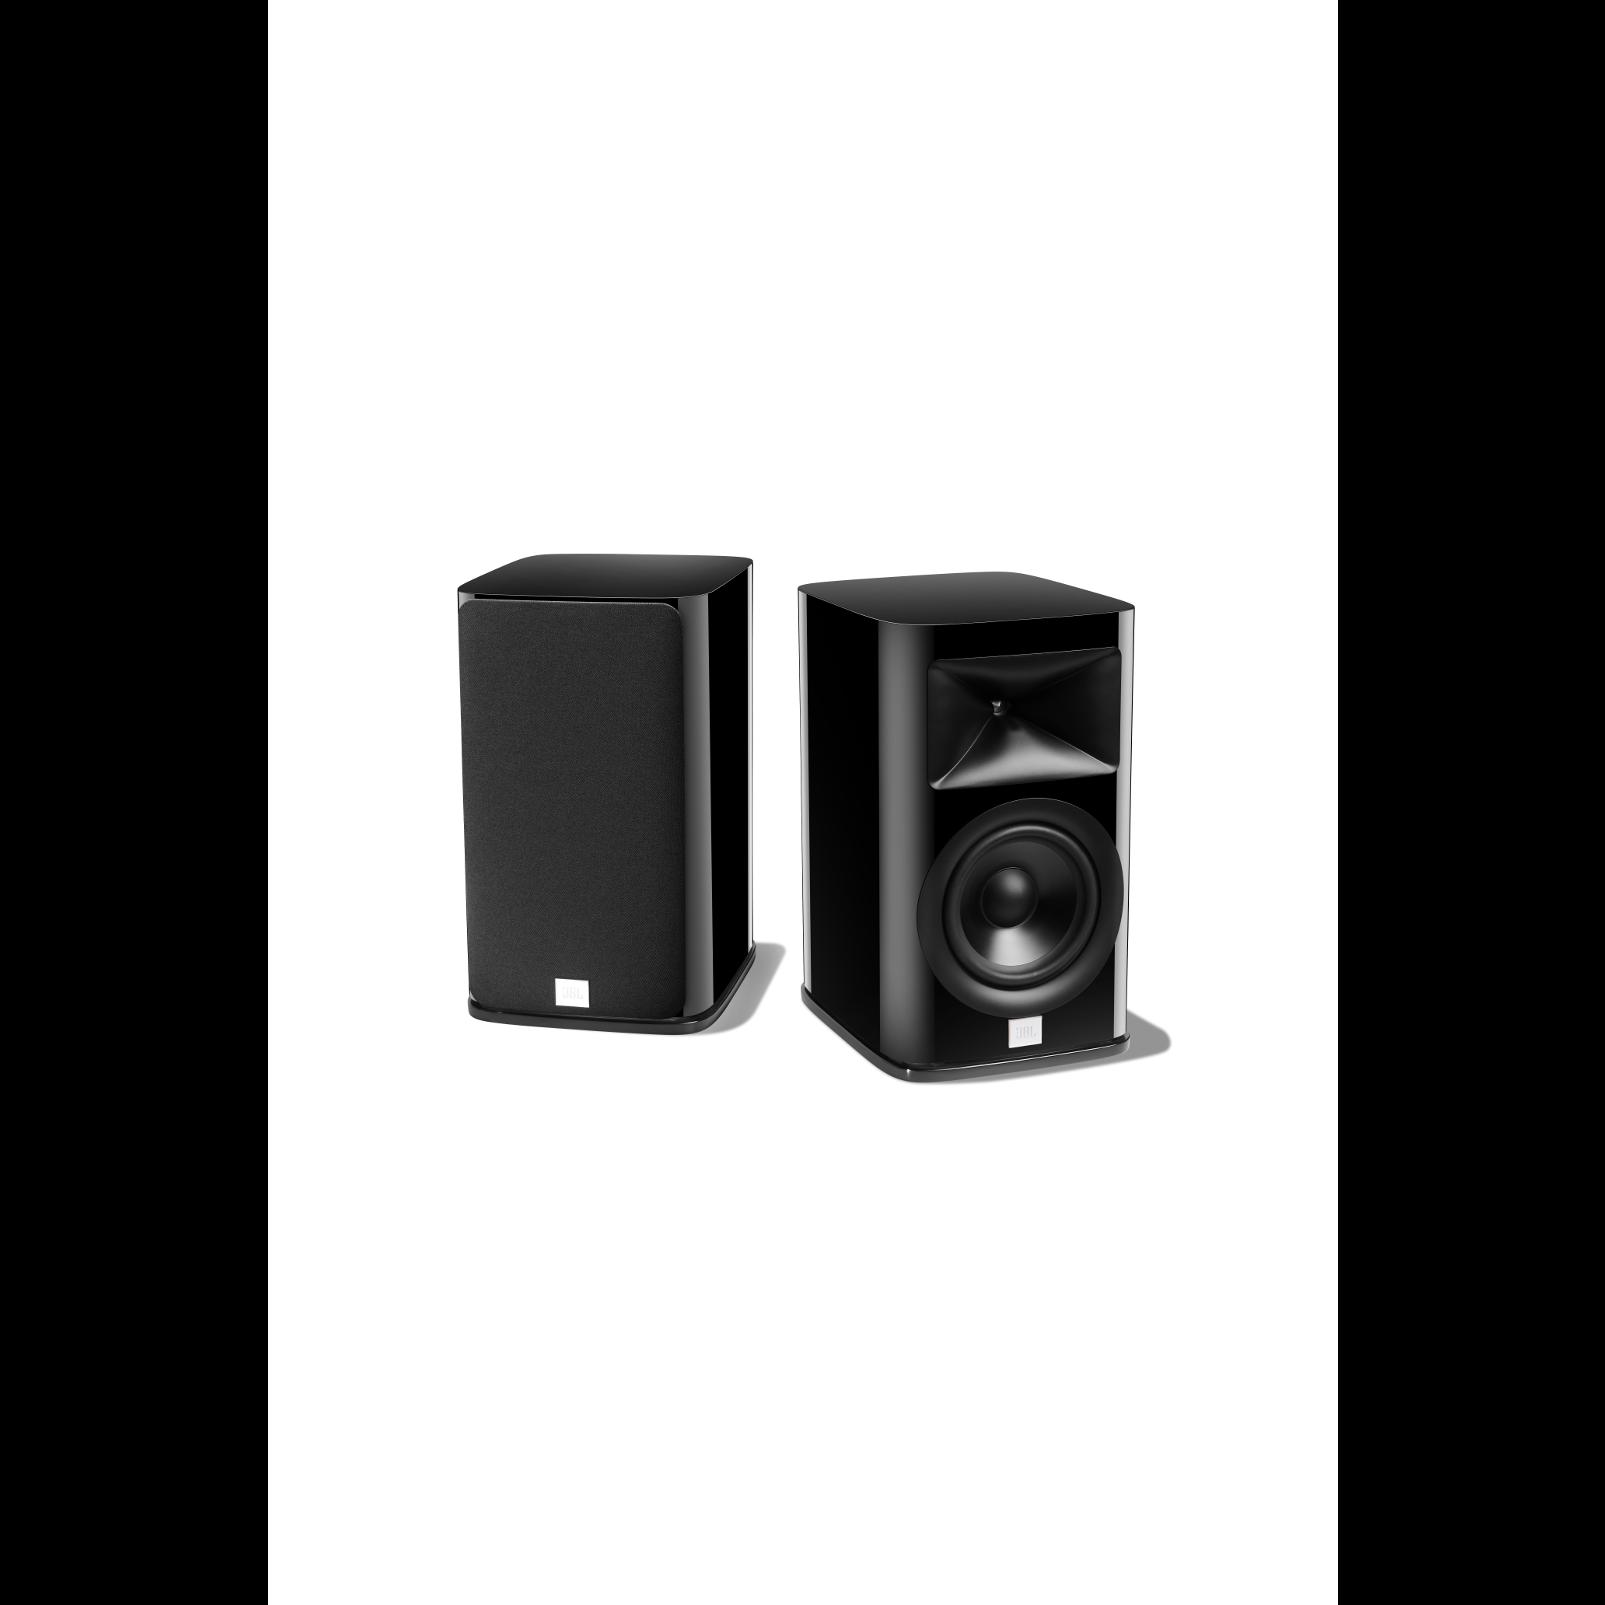 HDI-1600 - Black Gloss - 2-way 6.5-inch (165mm) Bookshelf Loudspeaker - Detailshot 4